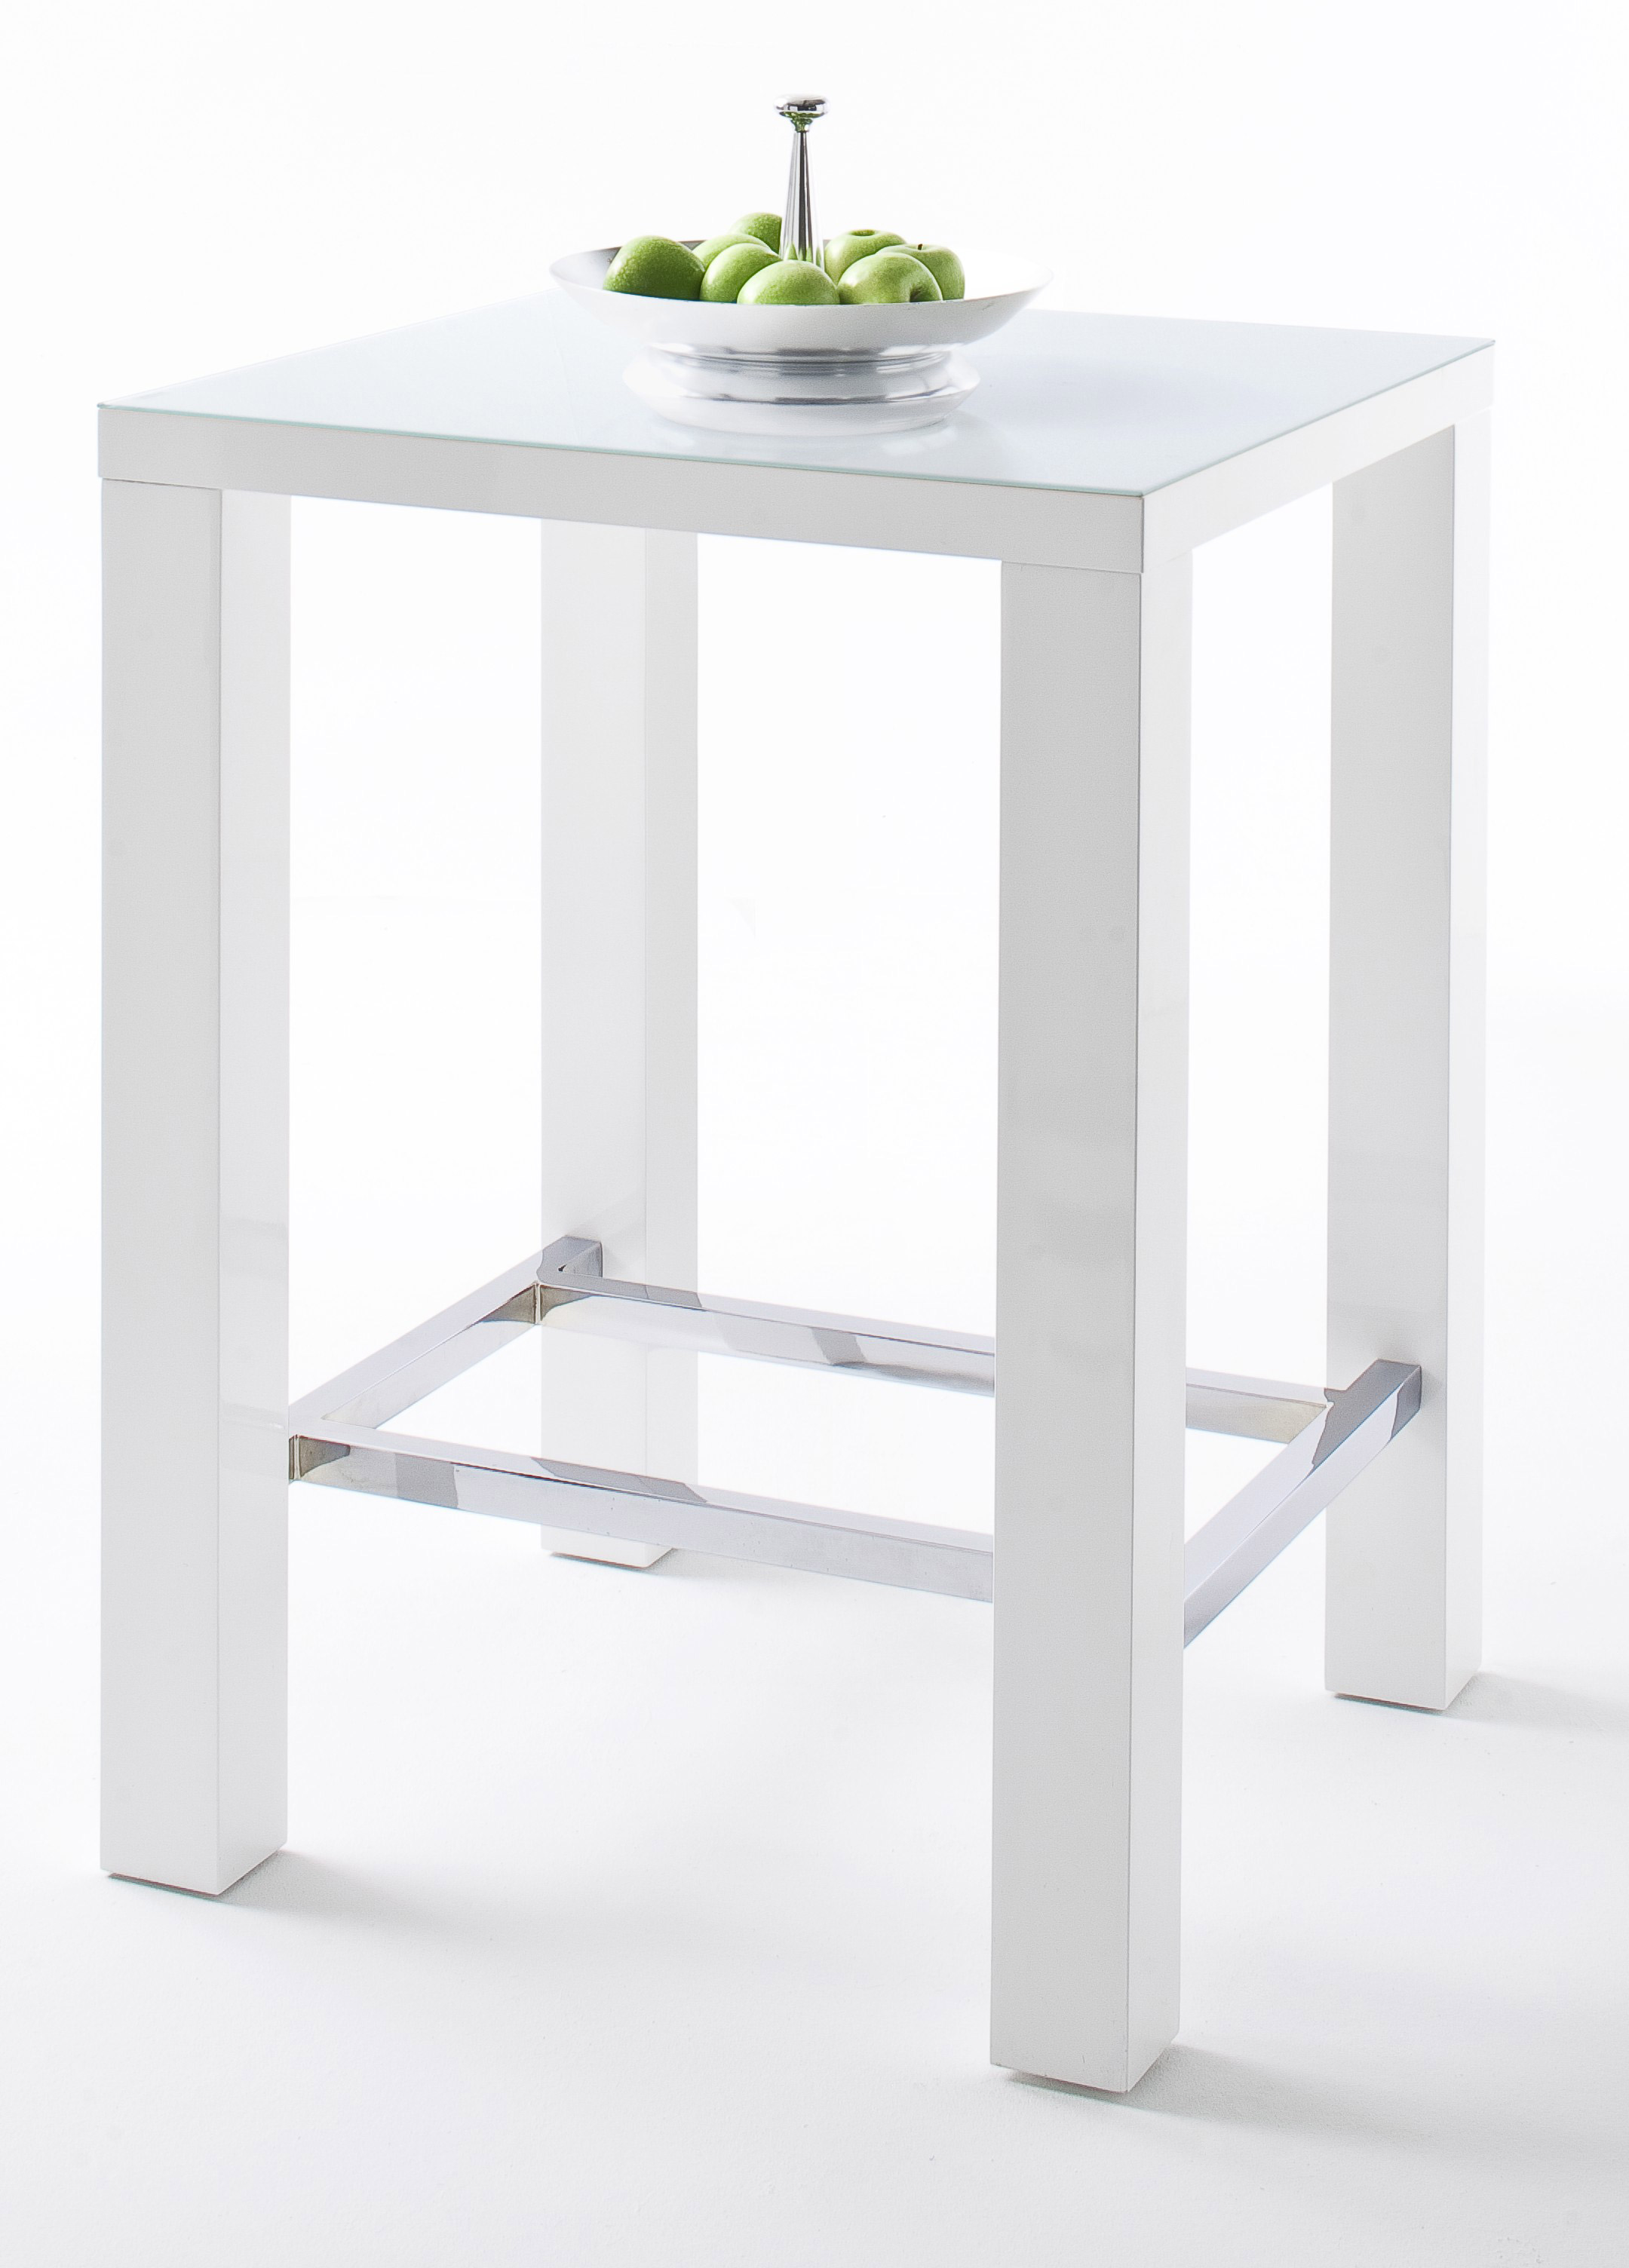 Bartafel Keuken Kopen : 24designs Bartafel Queen Glass L120 X B60 X H107 Cm Hoogglans Wit in